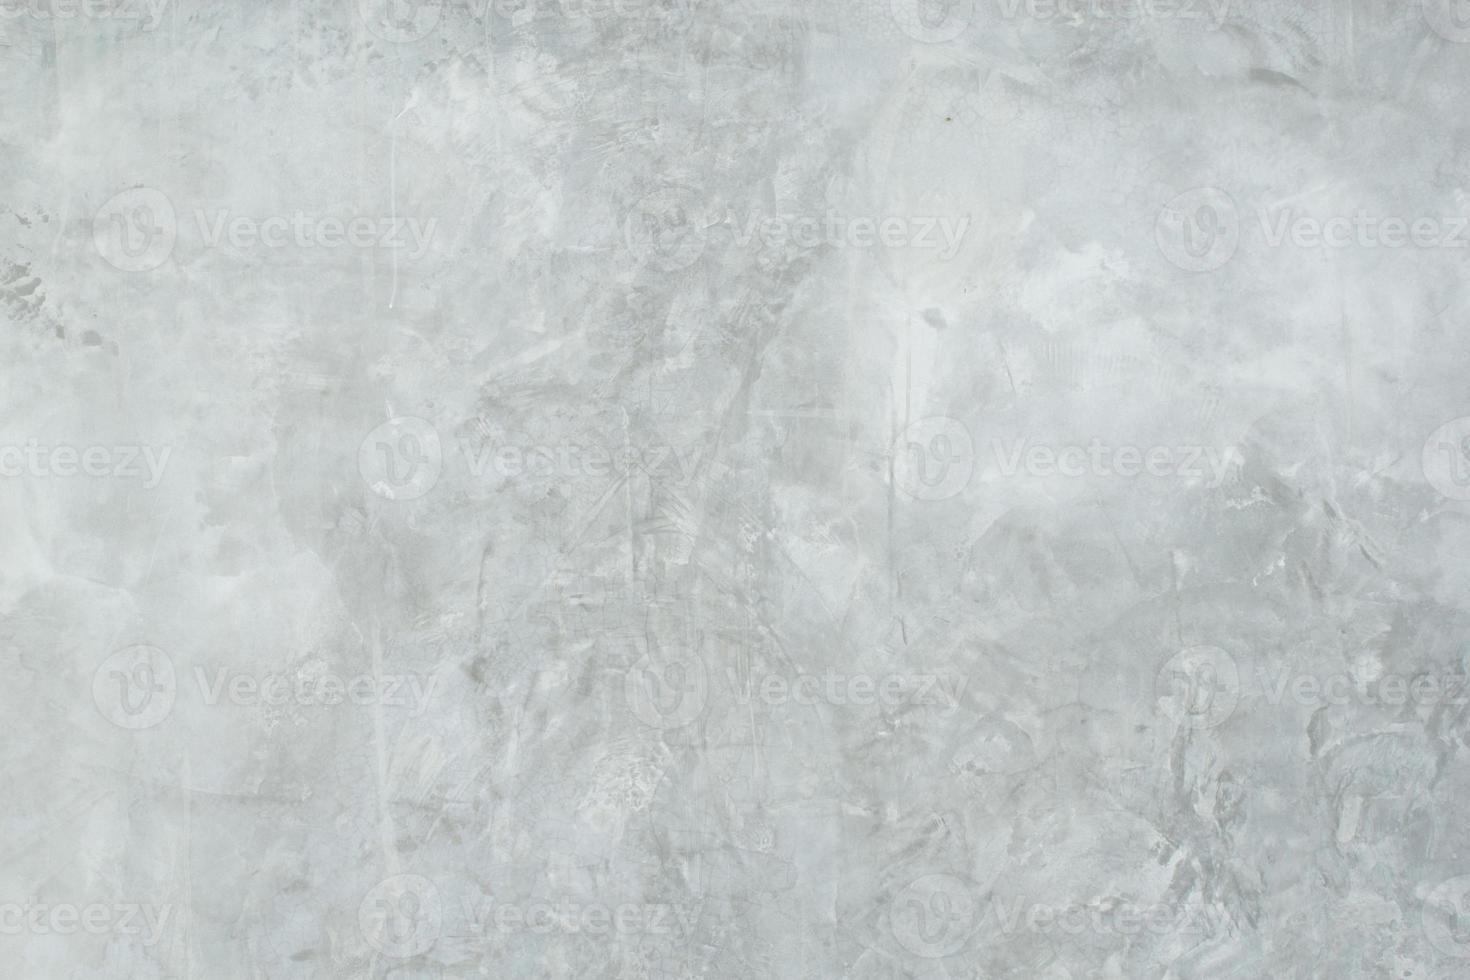 mur de béton - fond texturé photo